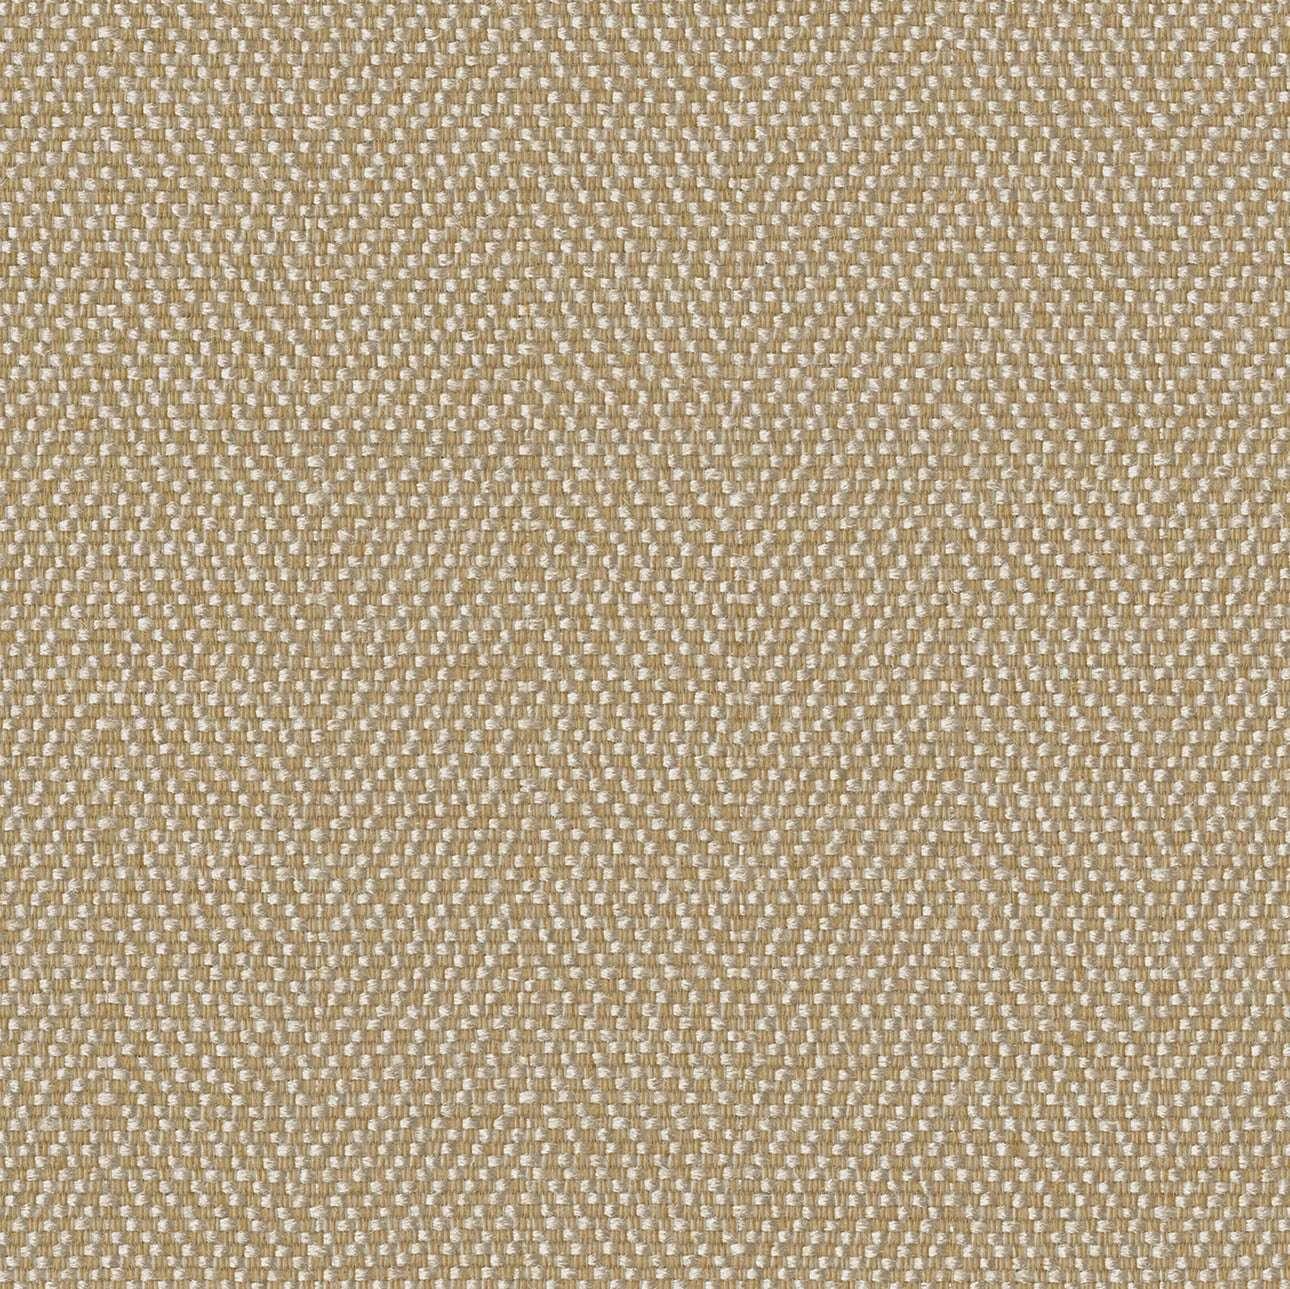 Stolsöverdrag i kollektionen Living, Tyg: 160-43